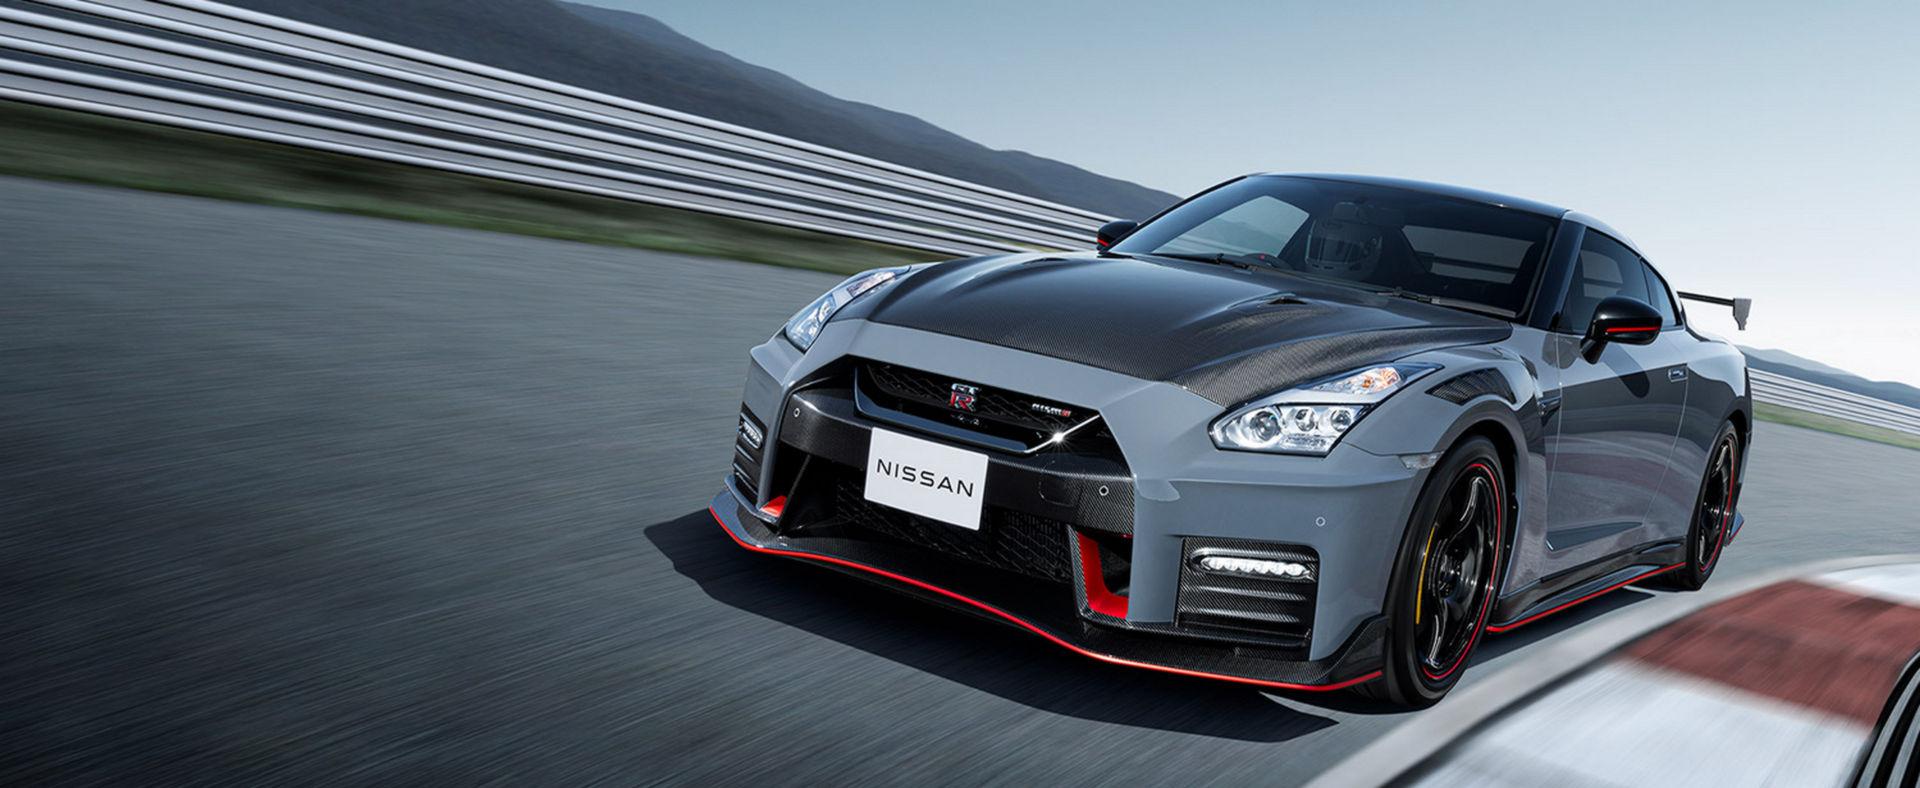 2022-Nissan-GT-R-Nismo-36.jpg